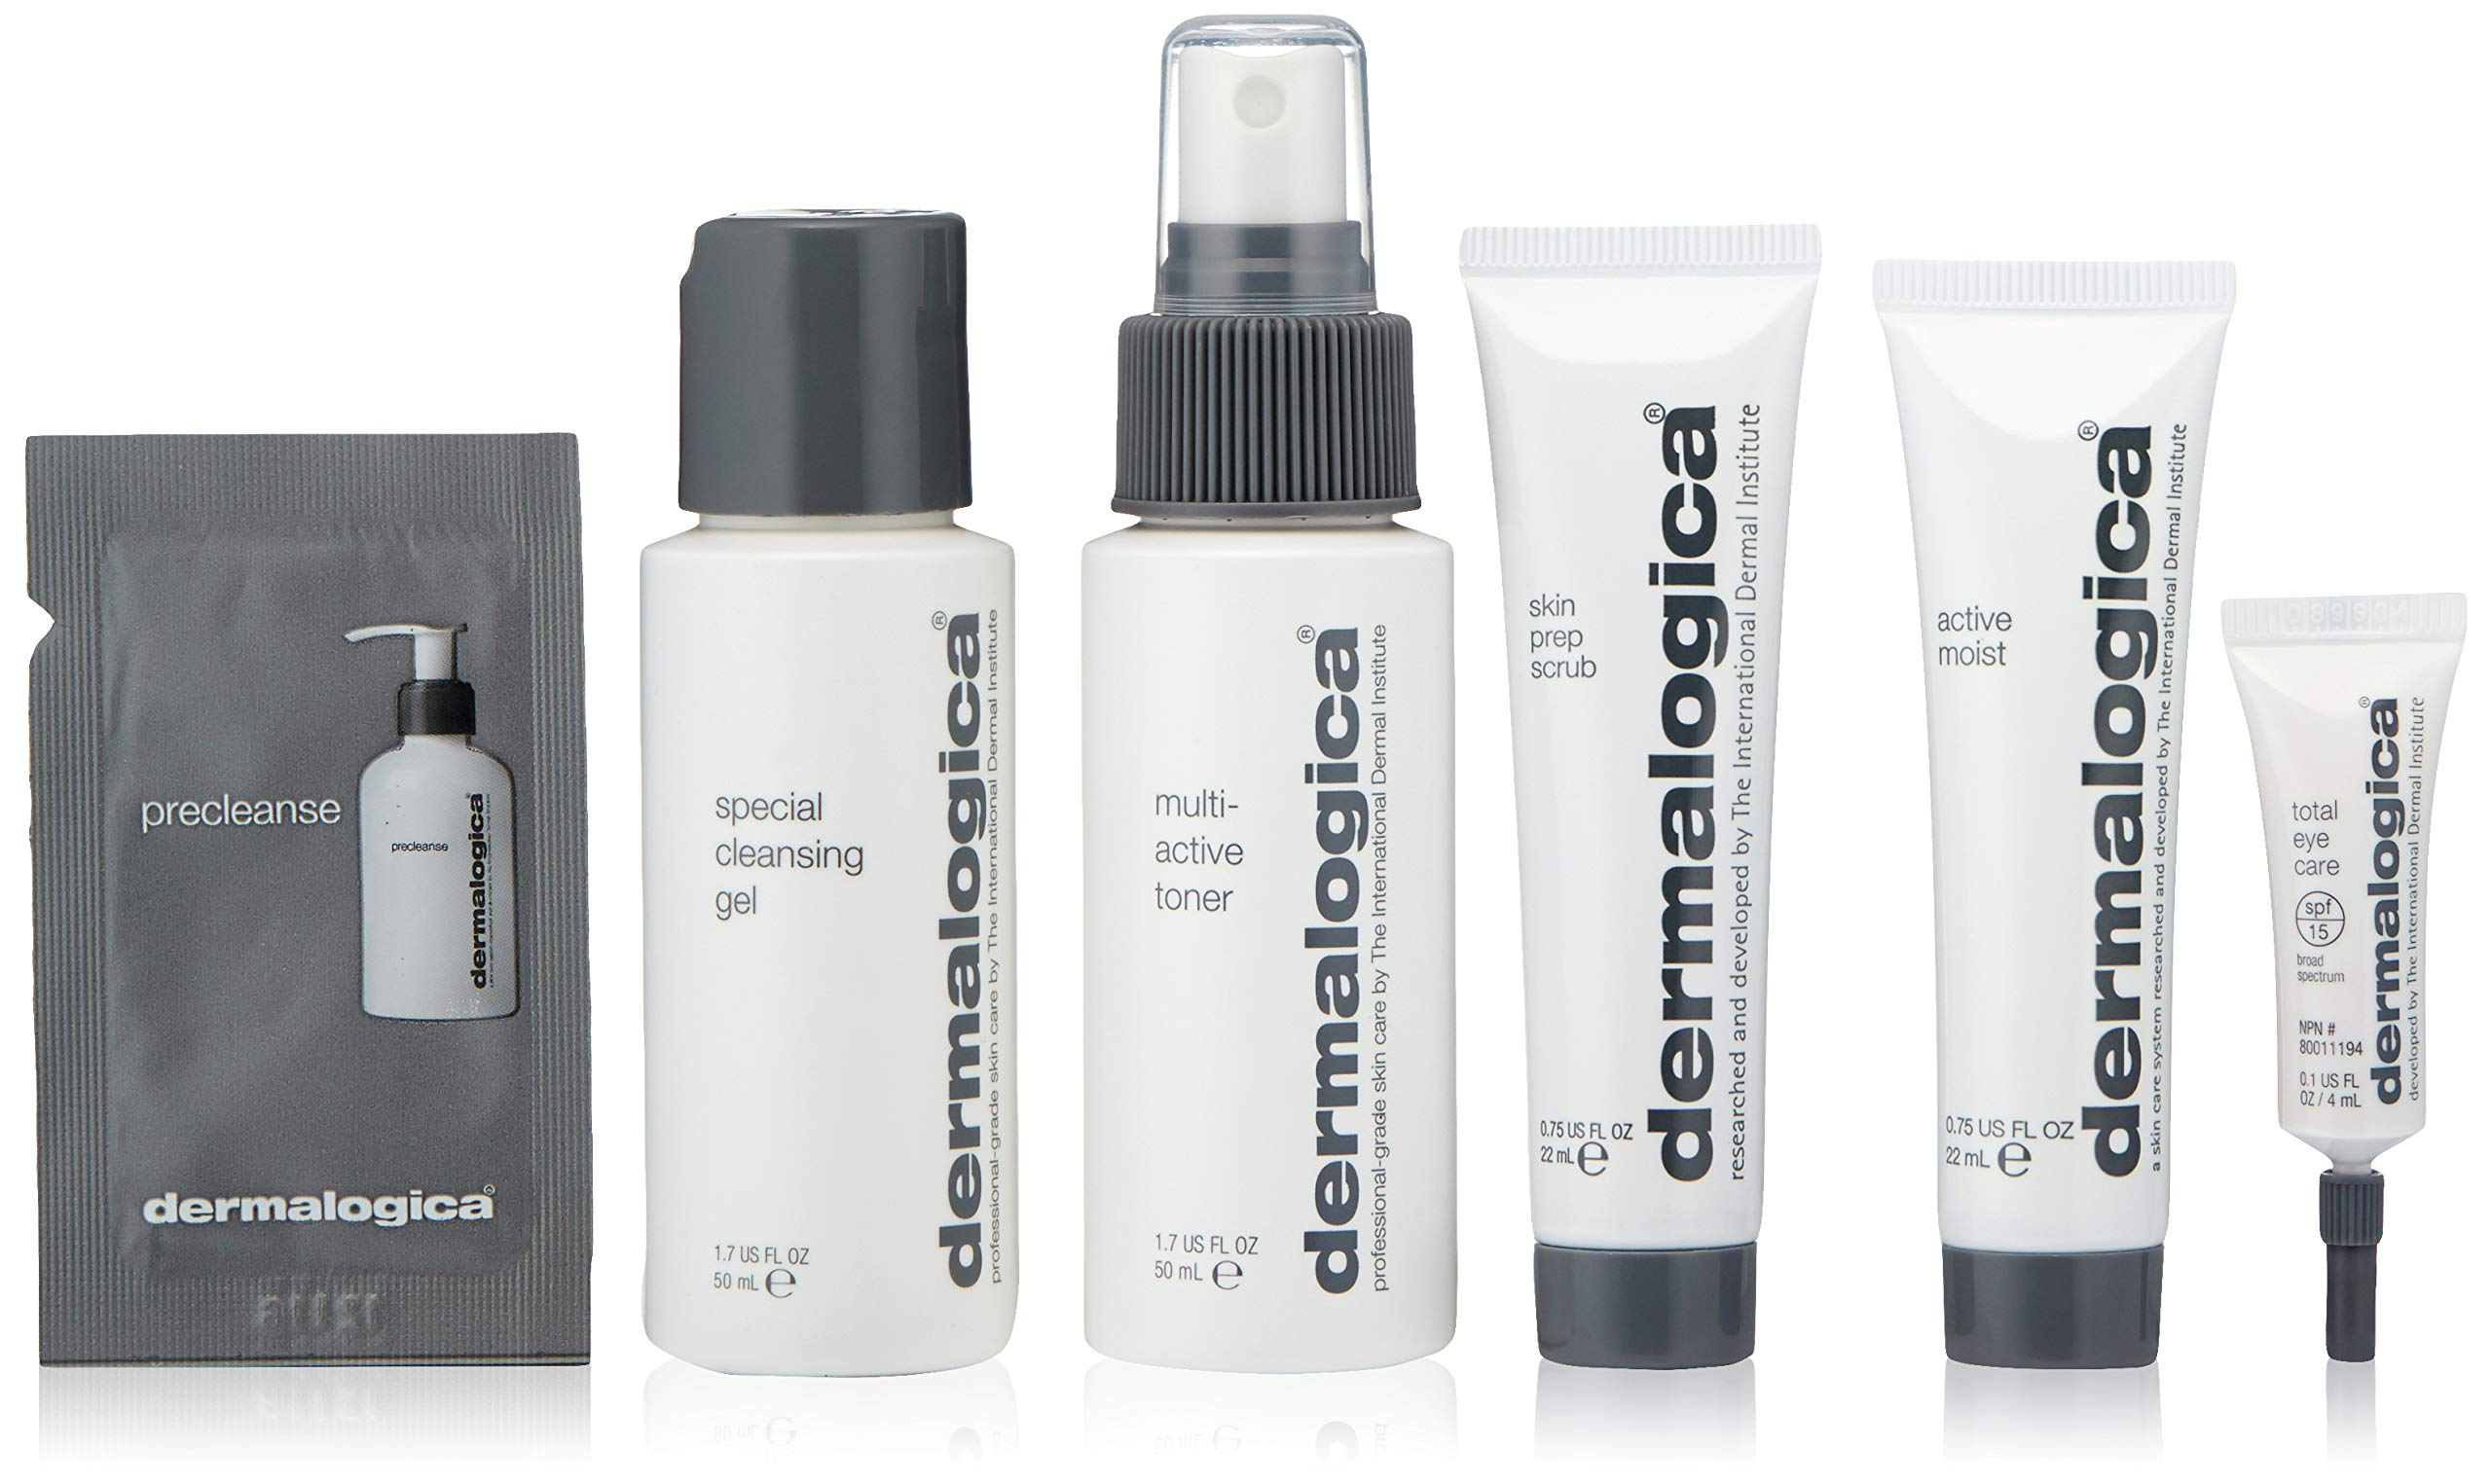 Dermalogica Normal/Oily Skin Kit by DERMALOGICA